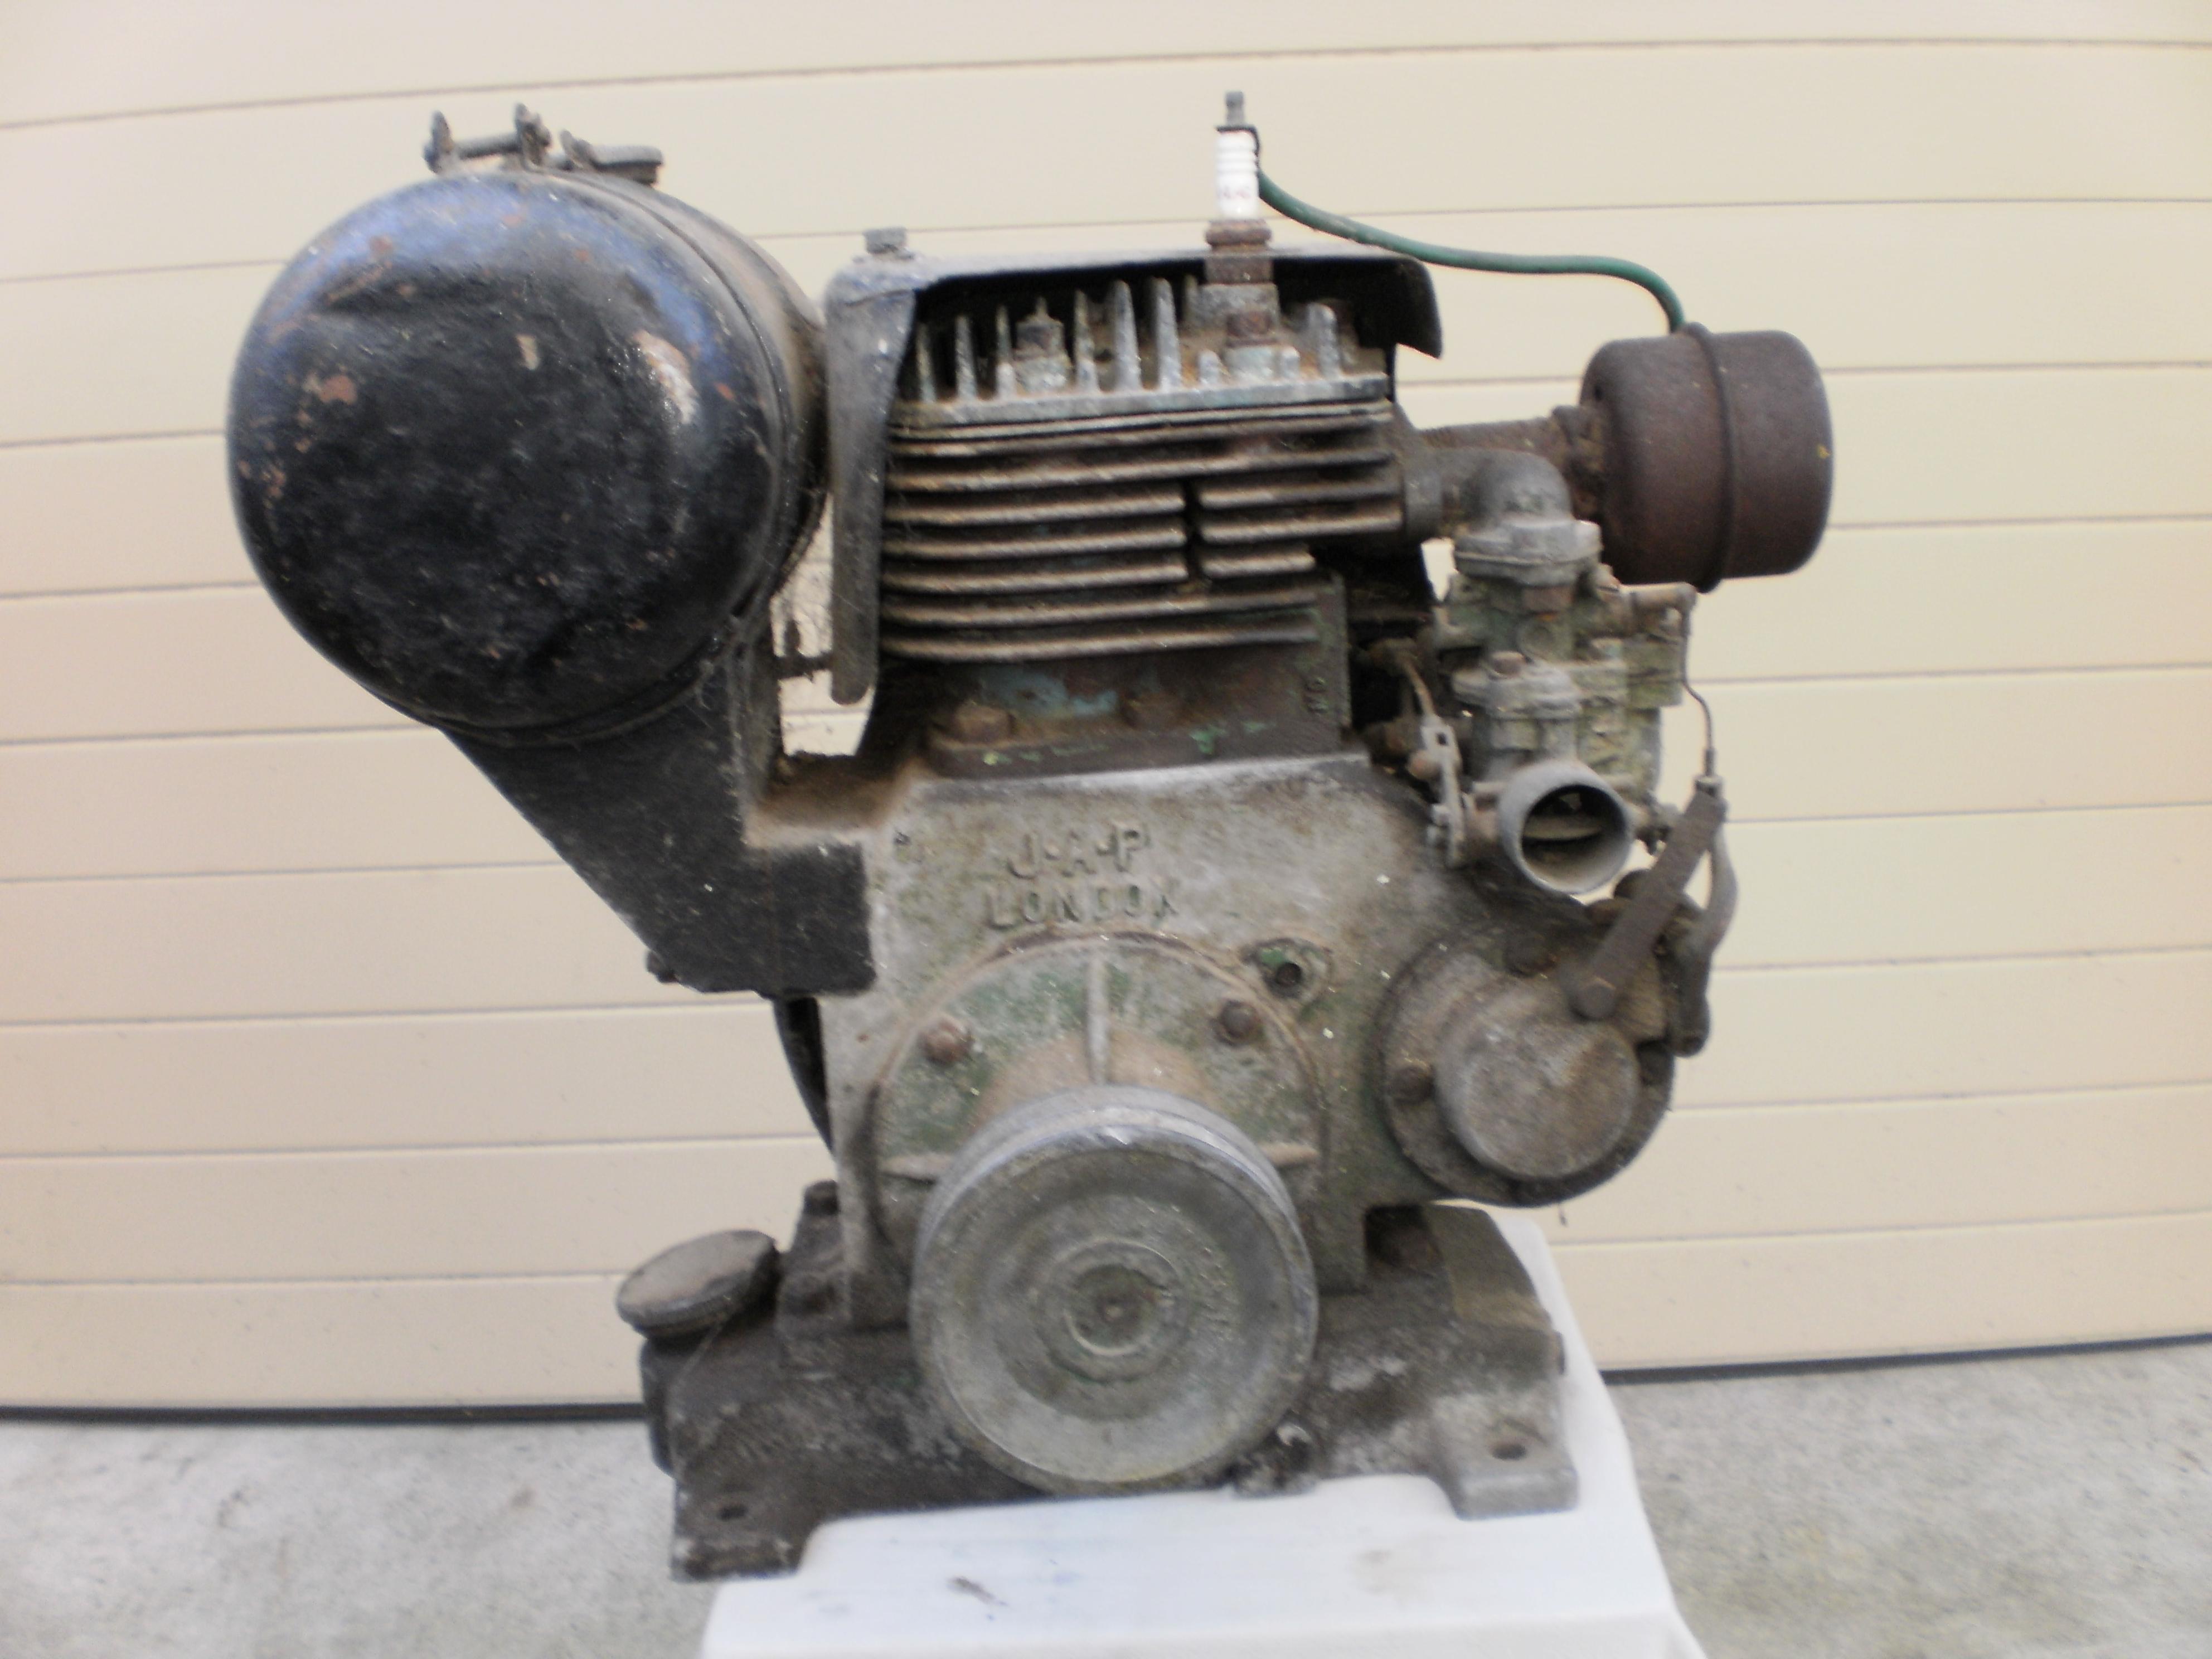 Jap stationary engine dating